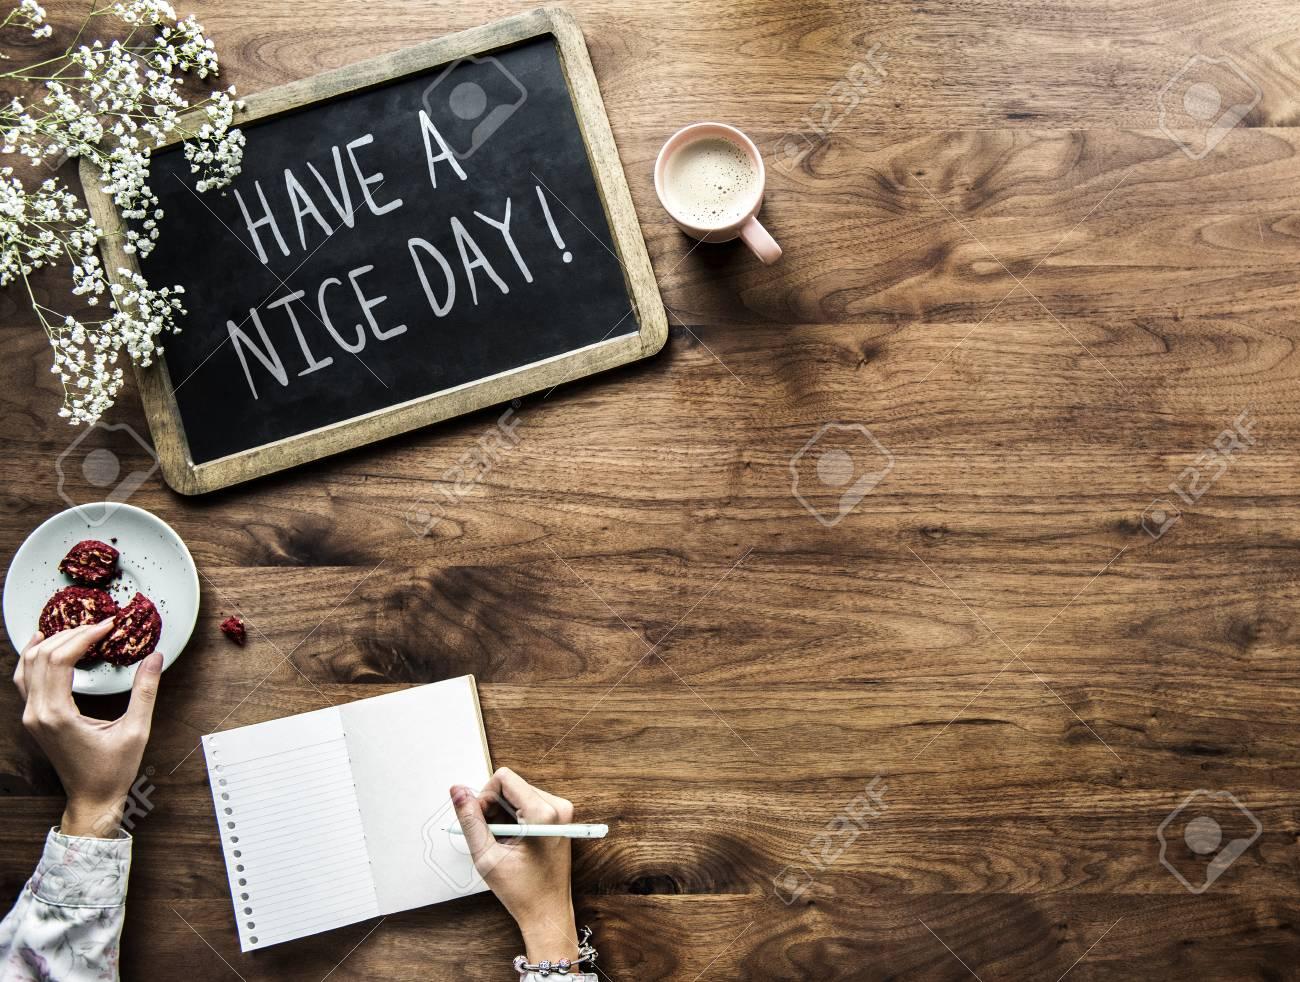 Have a nice day phrase written on a blackboard - 115861253